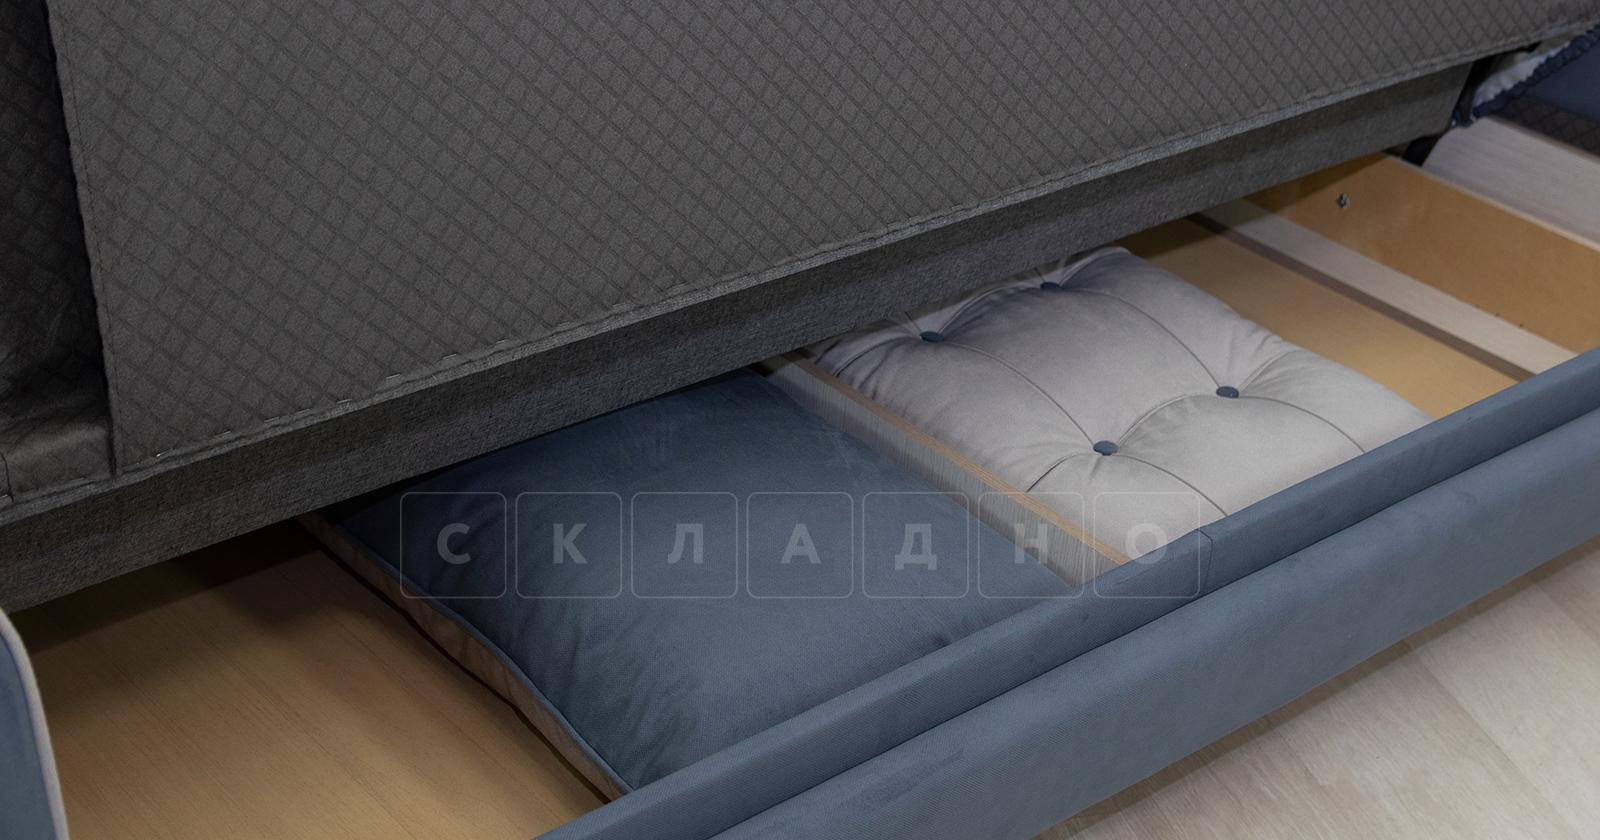 Диван-кровать Флэтфорд серо-синий фото 12 | интернет-магазин Складно